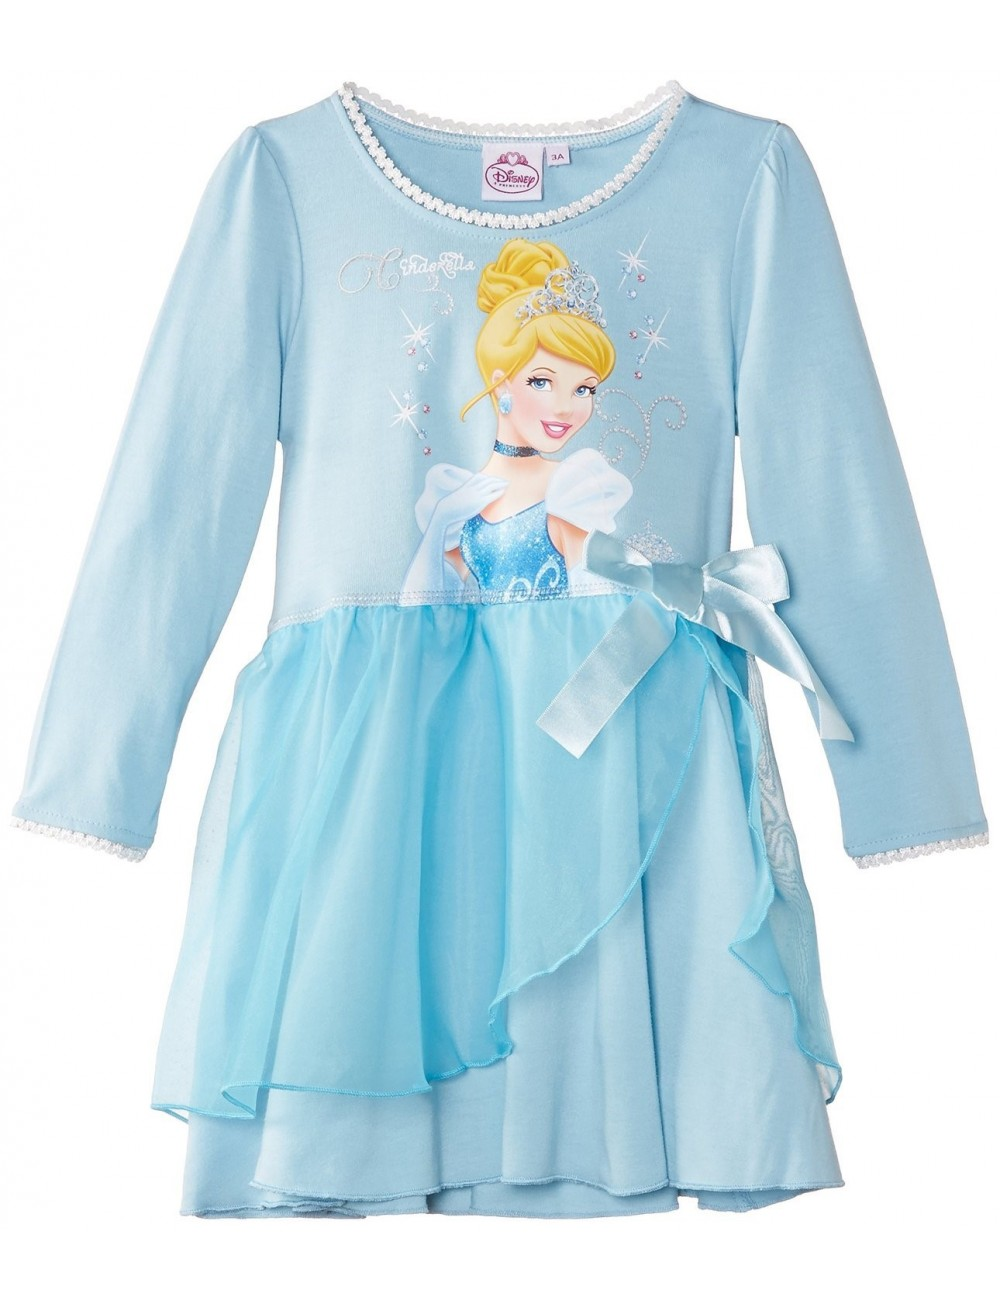 Camasa de noapte copii, Disney Cenusareasa